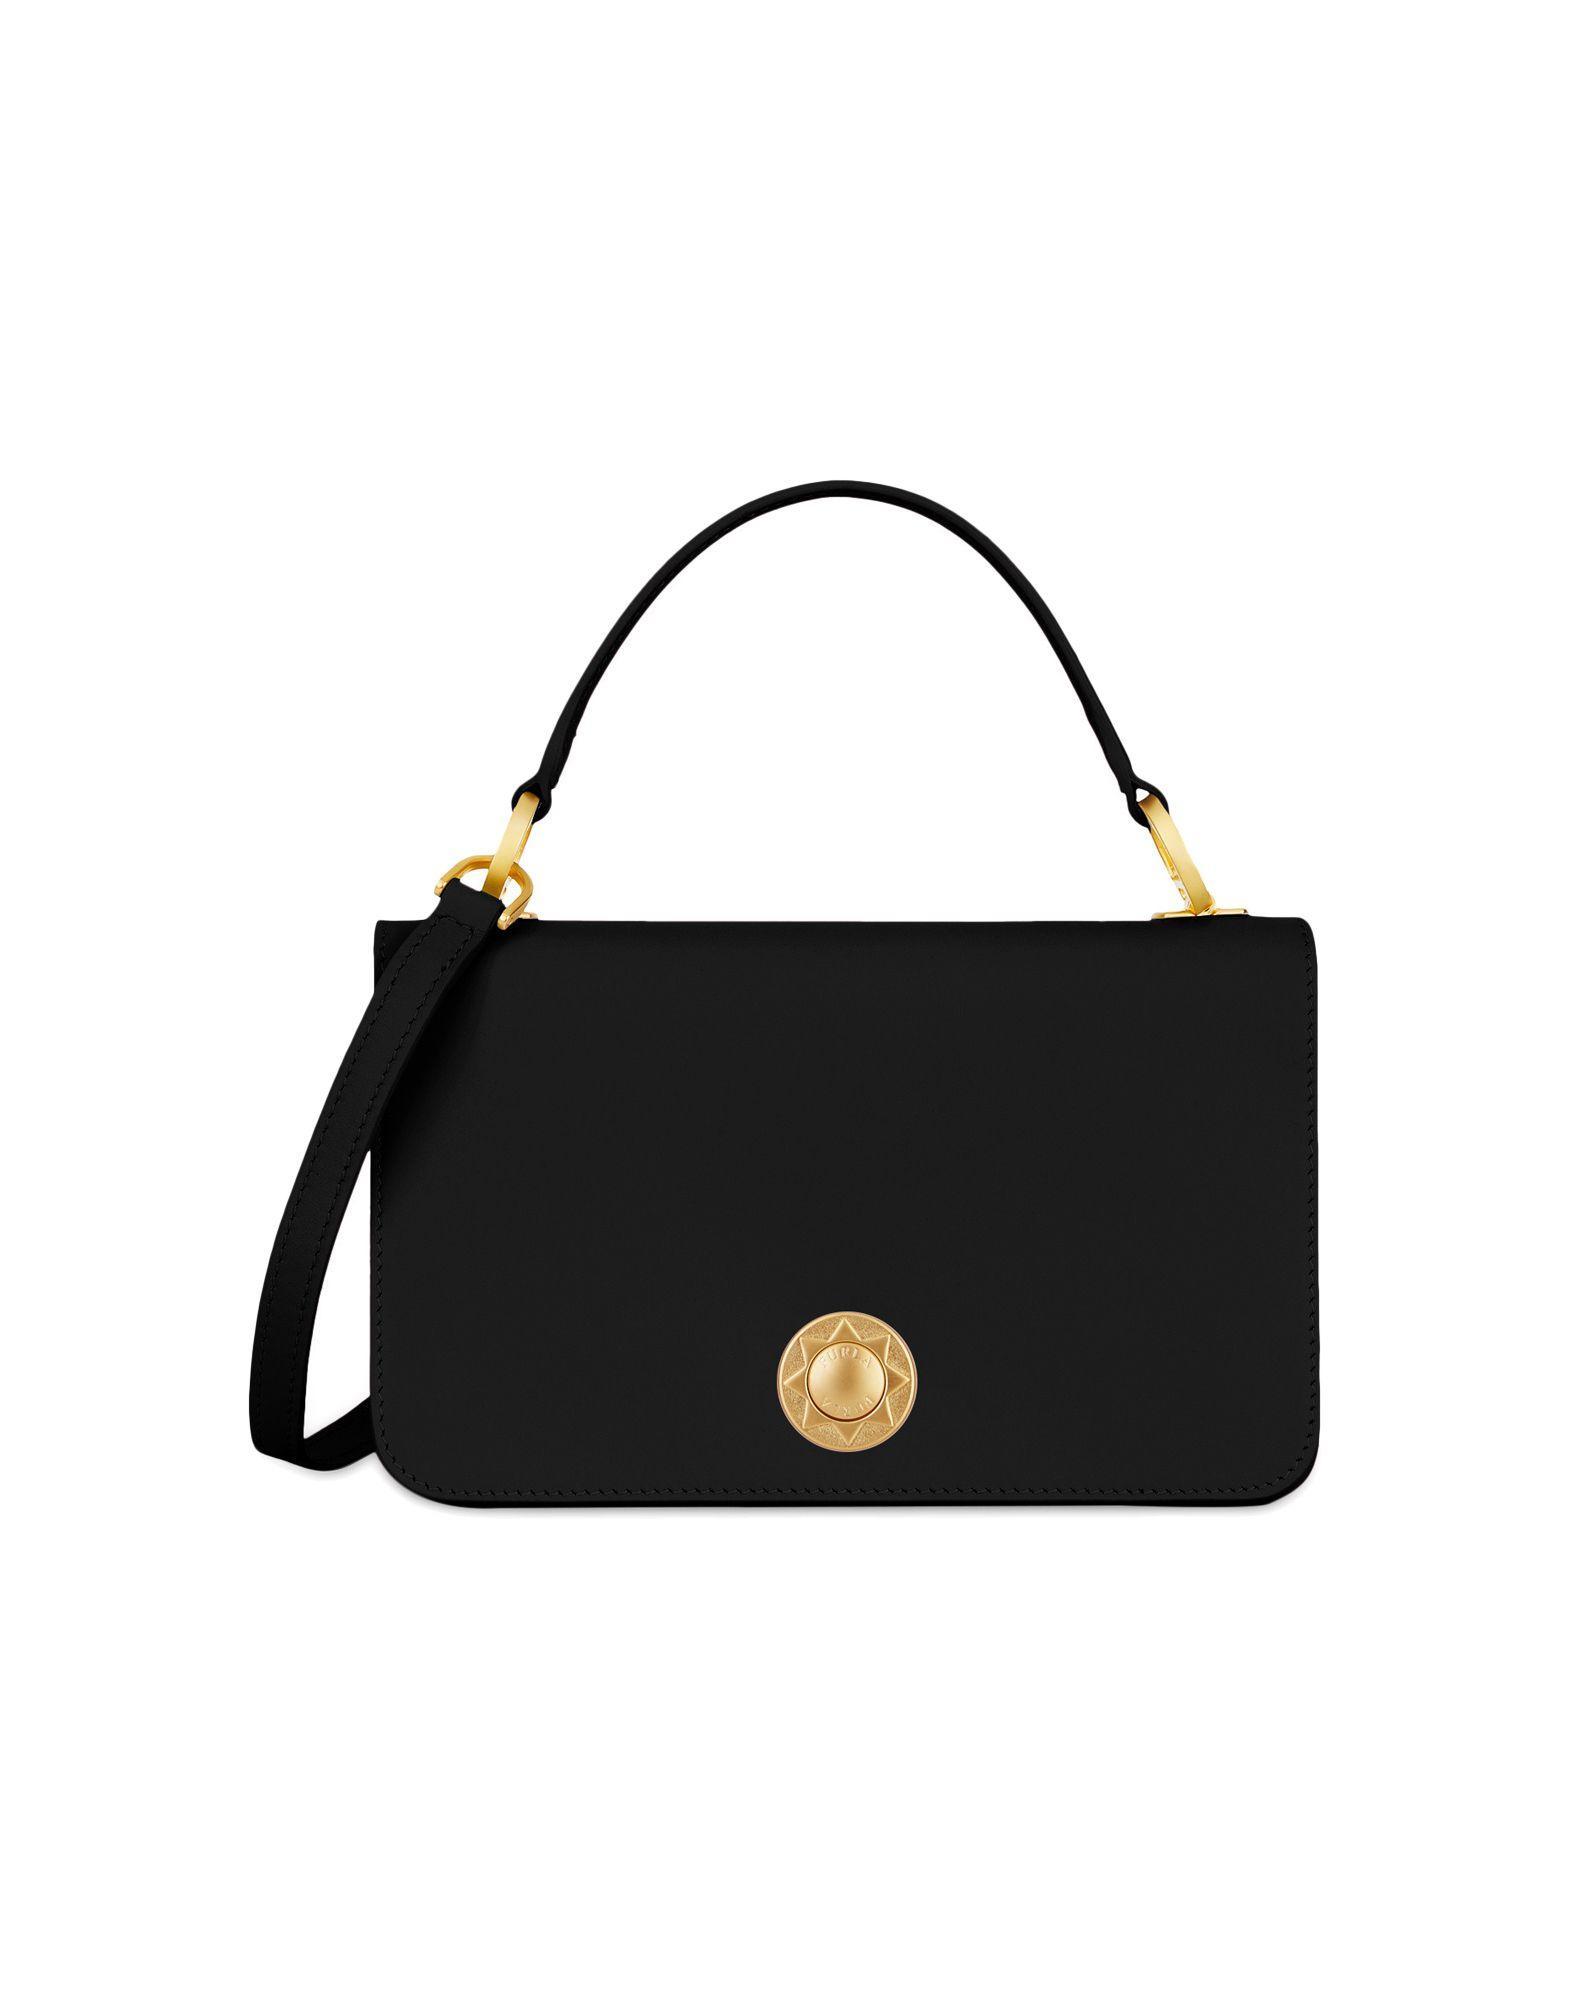 9d2a9c90caae Lyst - Furla Handbag in Black